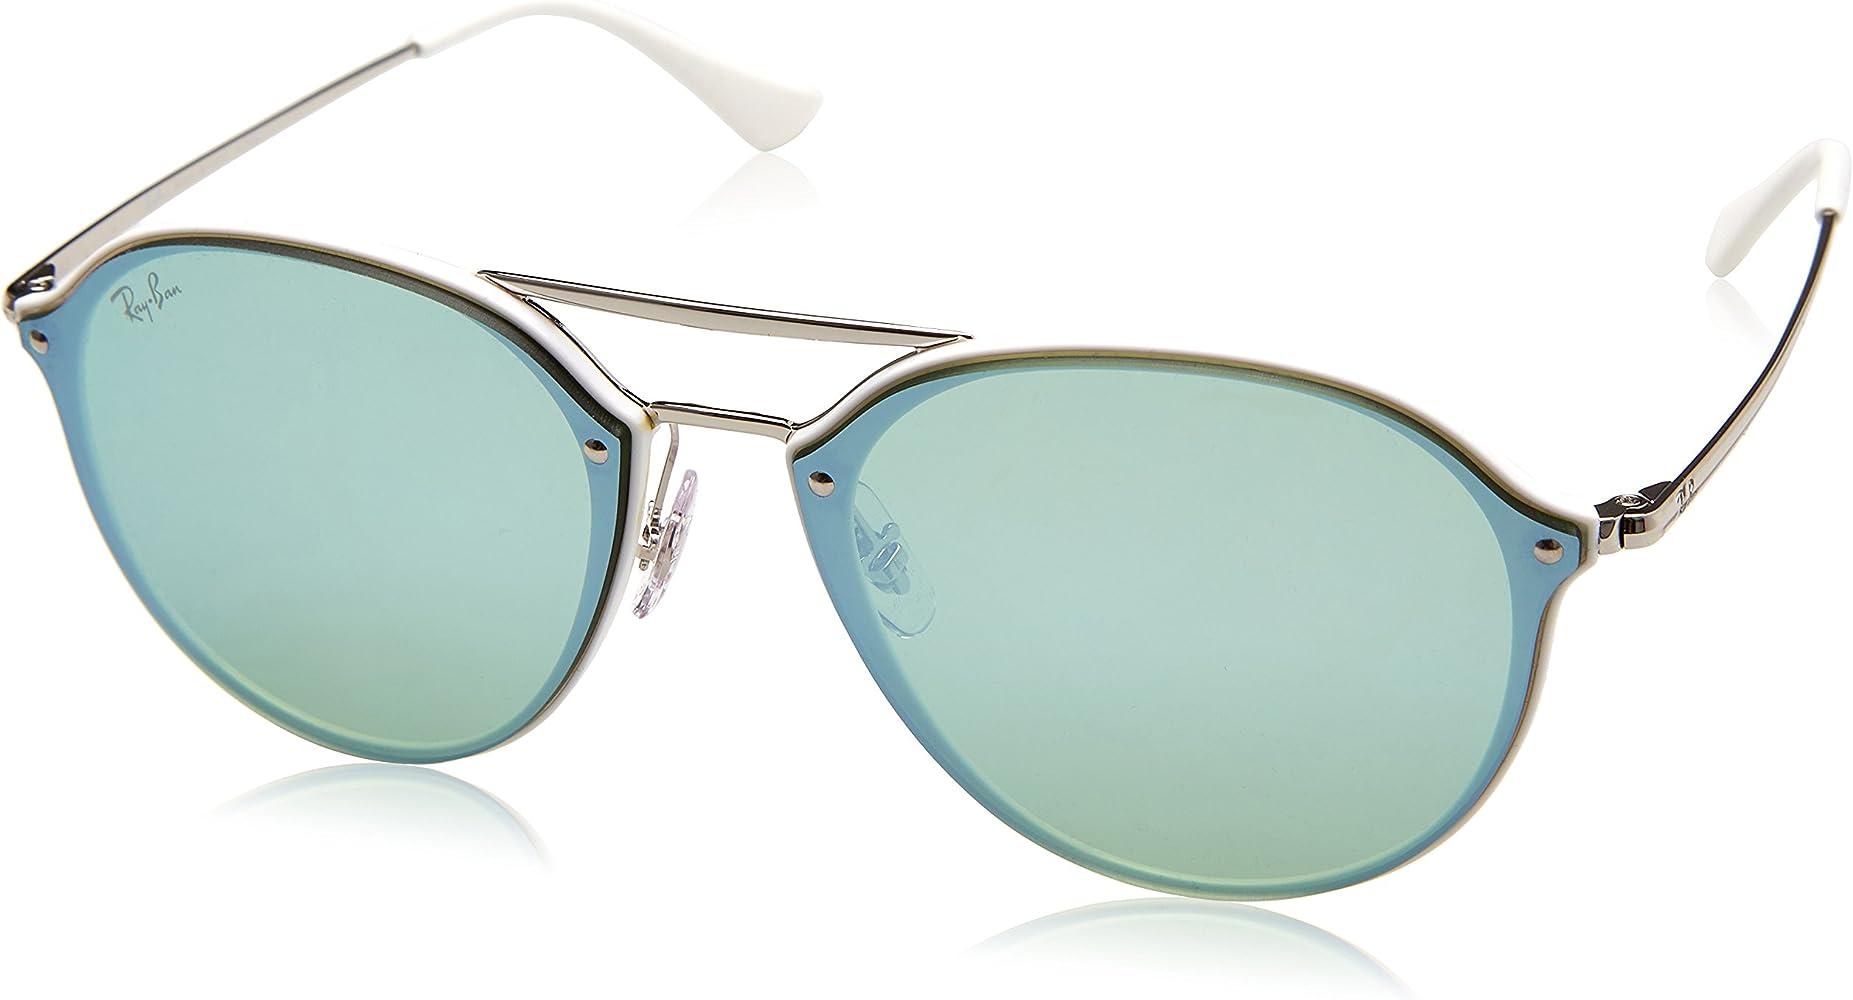 56857d13e986eb RAYBAN JUNIOR Unisex-Erwachsene Sonnenbrille Blaze Double Bridge ...